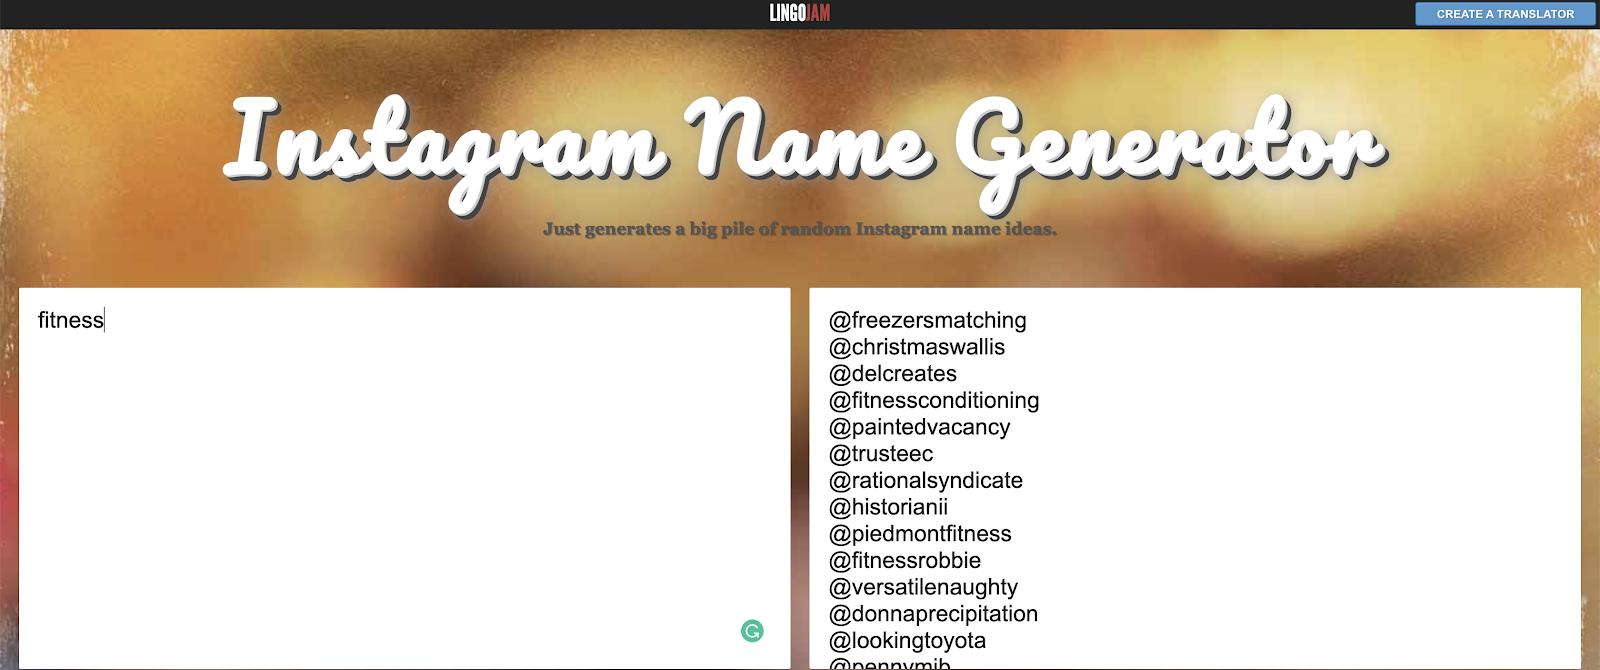 Instagram name generator - LingoJam